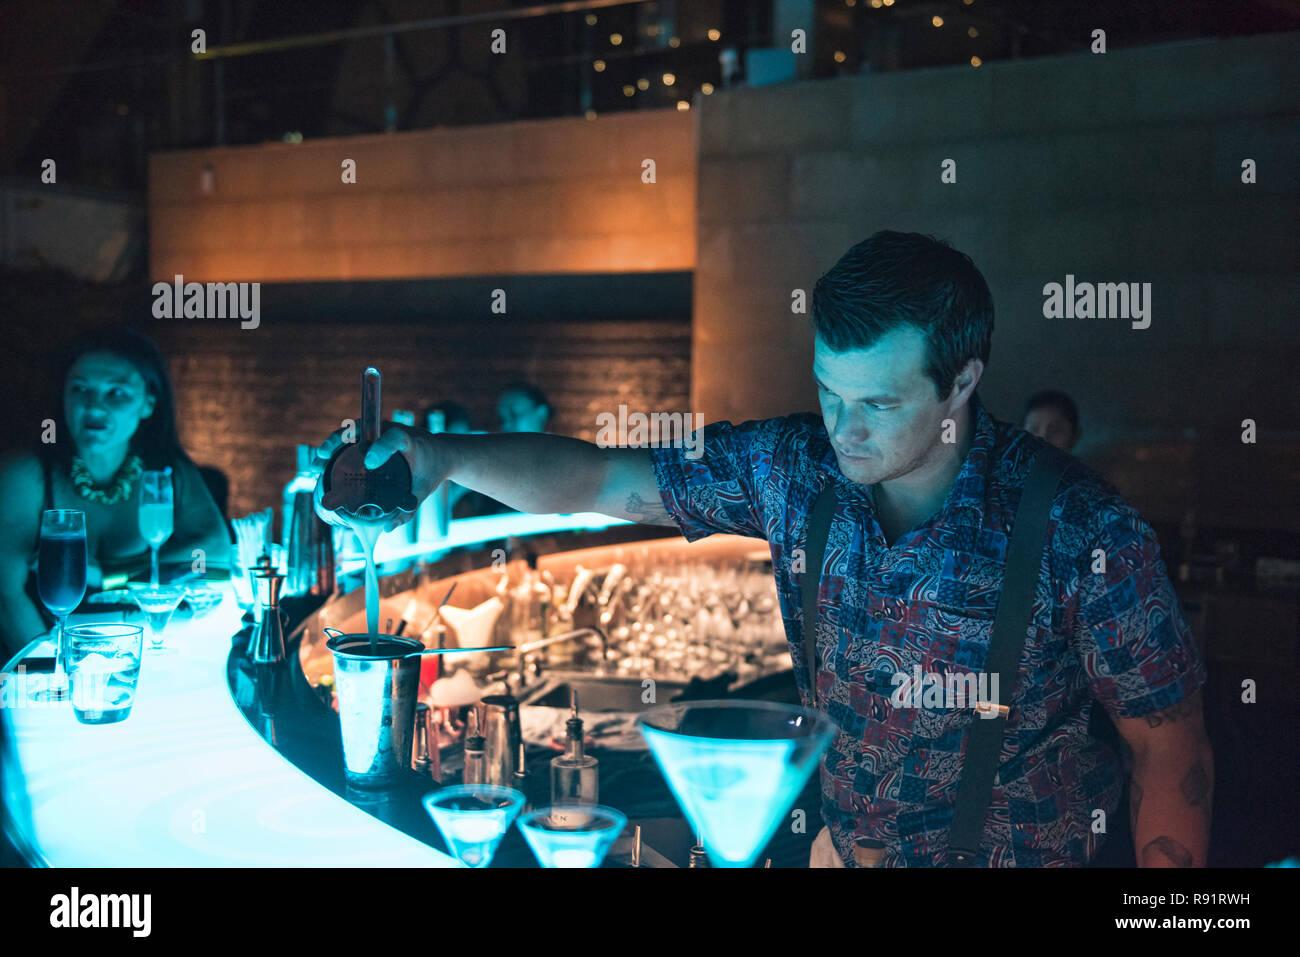 Mixing cocktails, Bangkok, Thailand - Stock Image